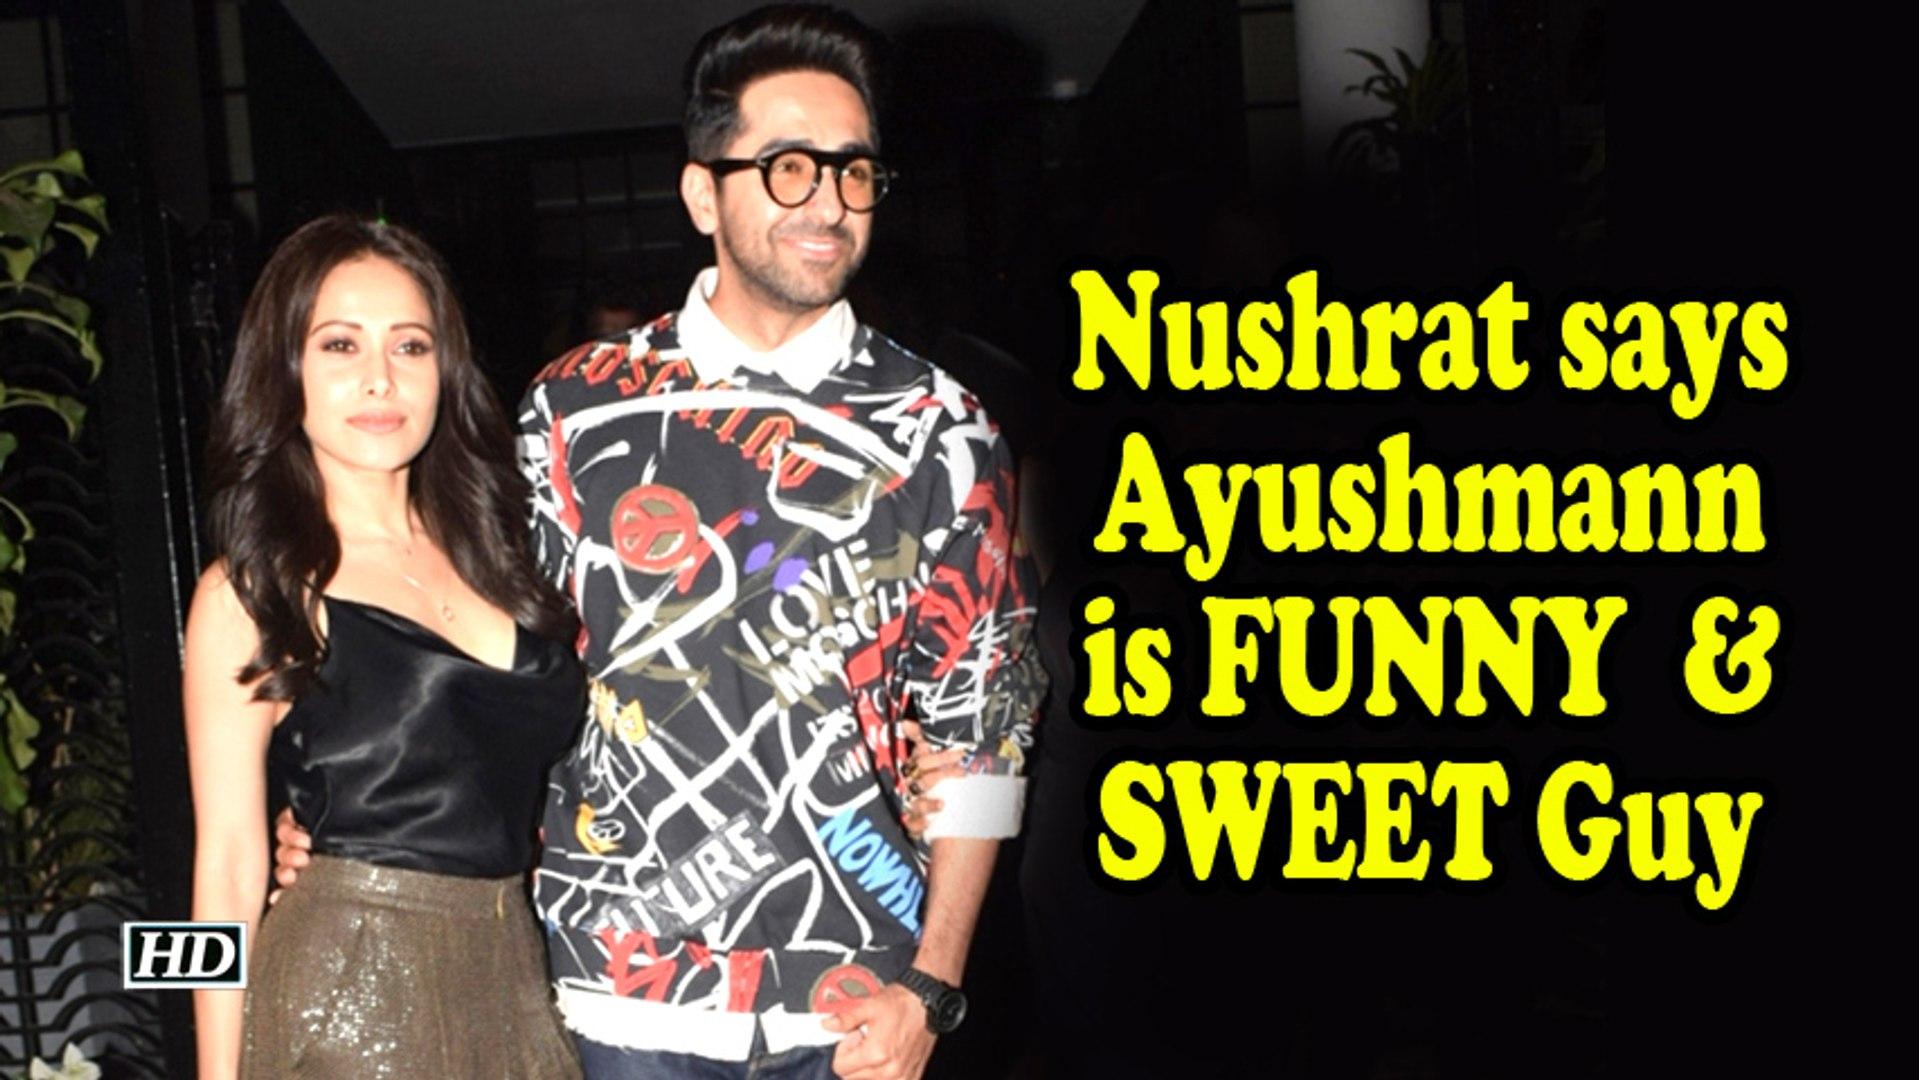 Nushrat says Ayushmann is FUNNY  & SWEET Guy